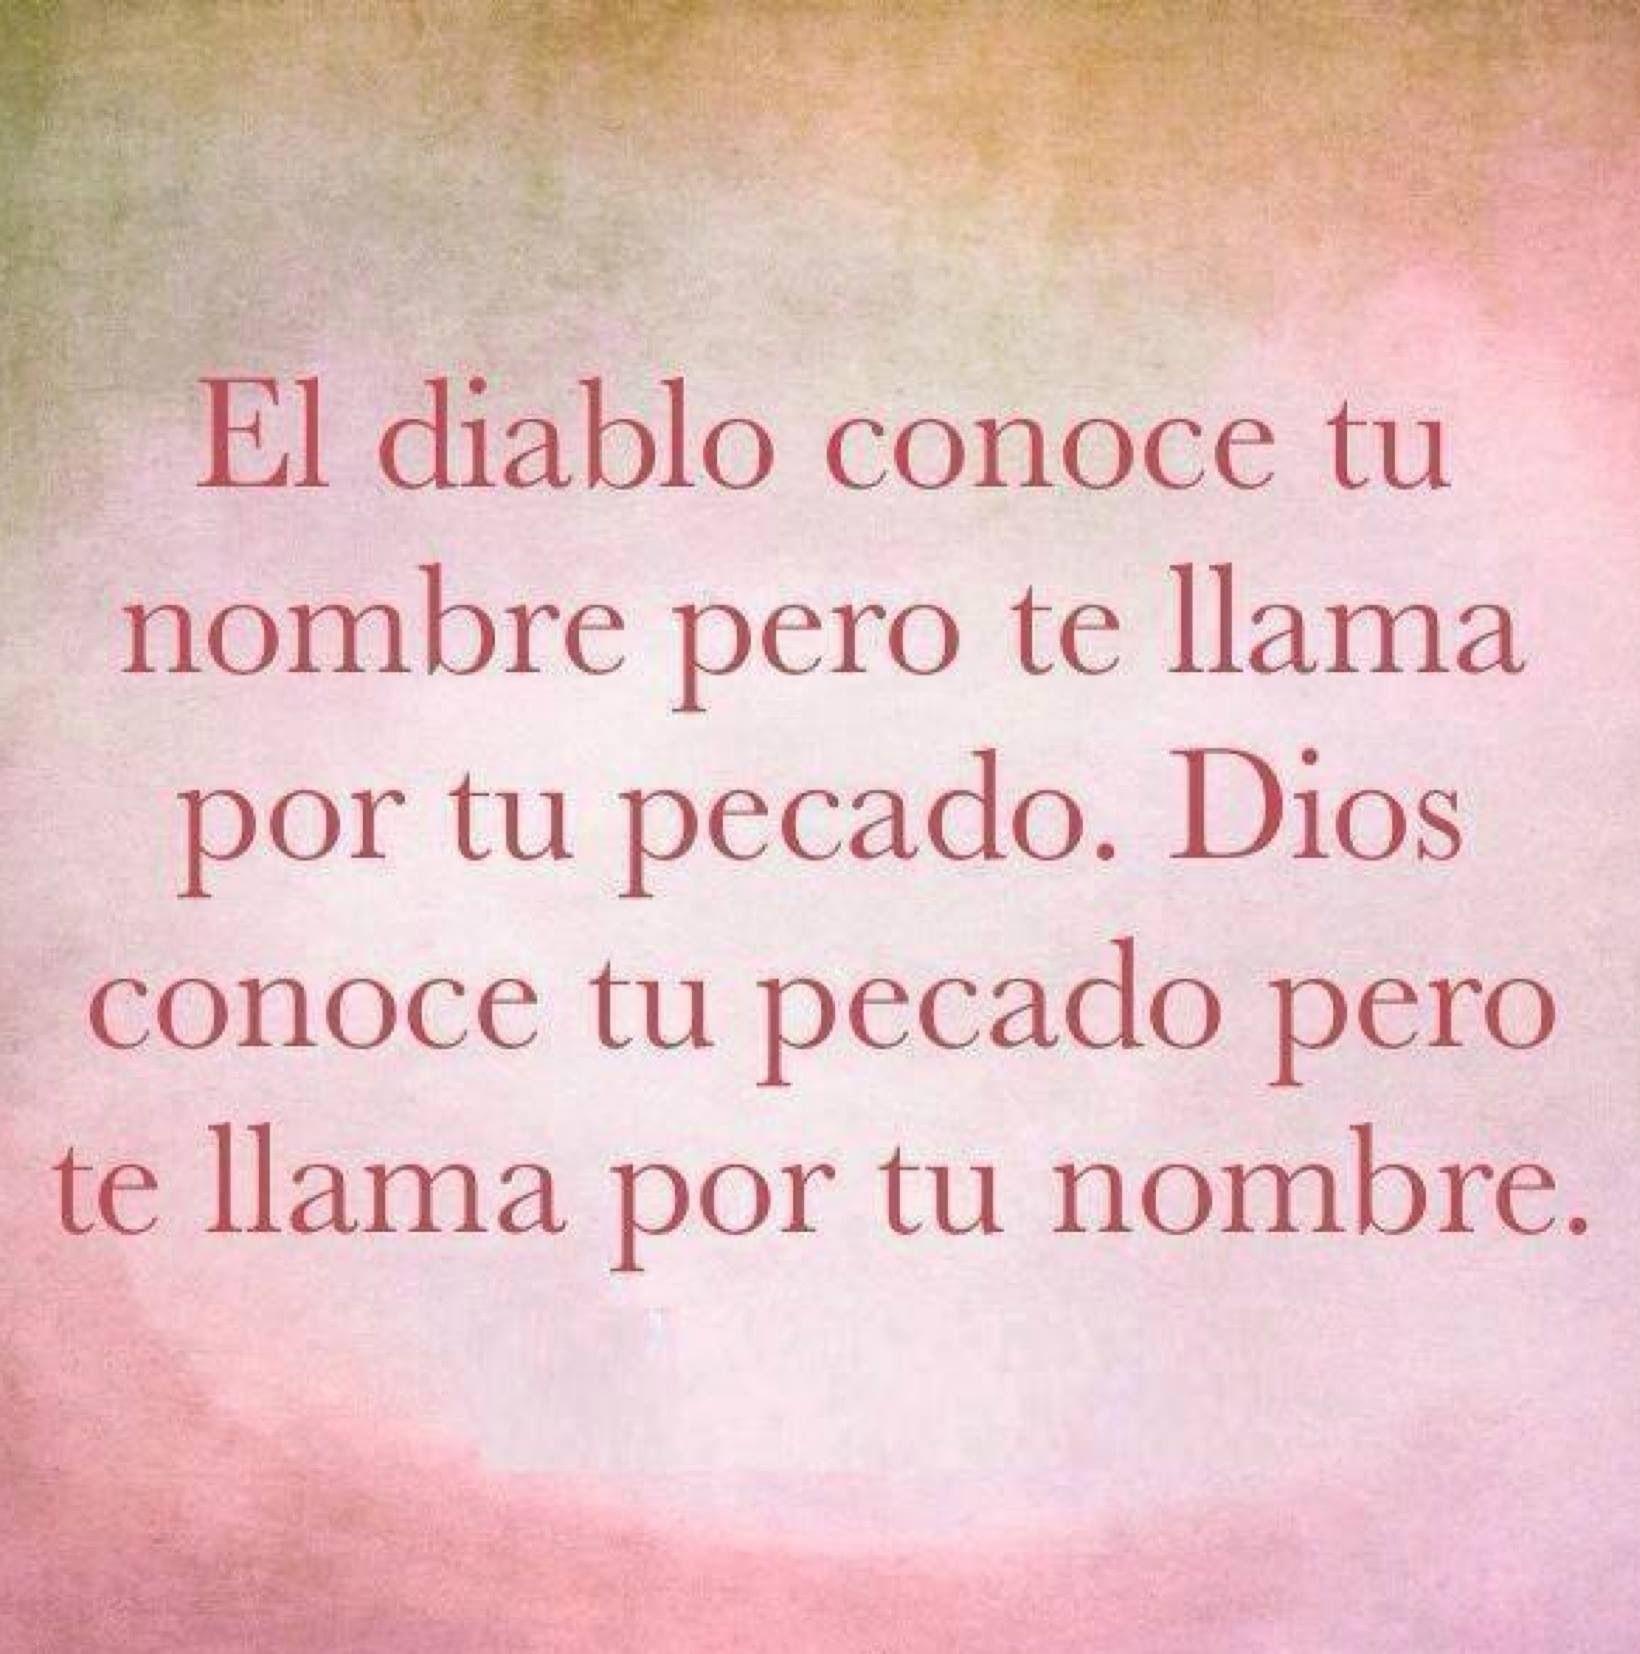 Frases español Dios amor vida @Luna Garcia